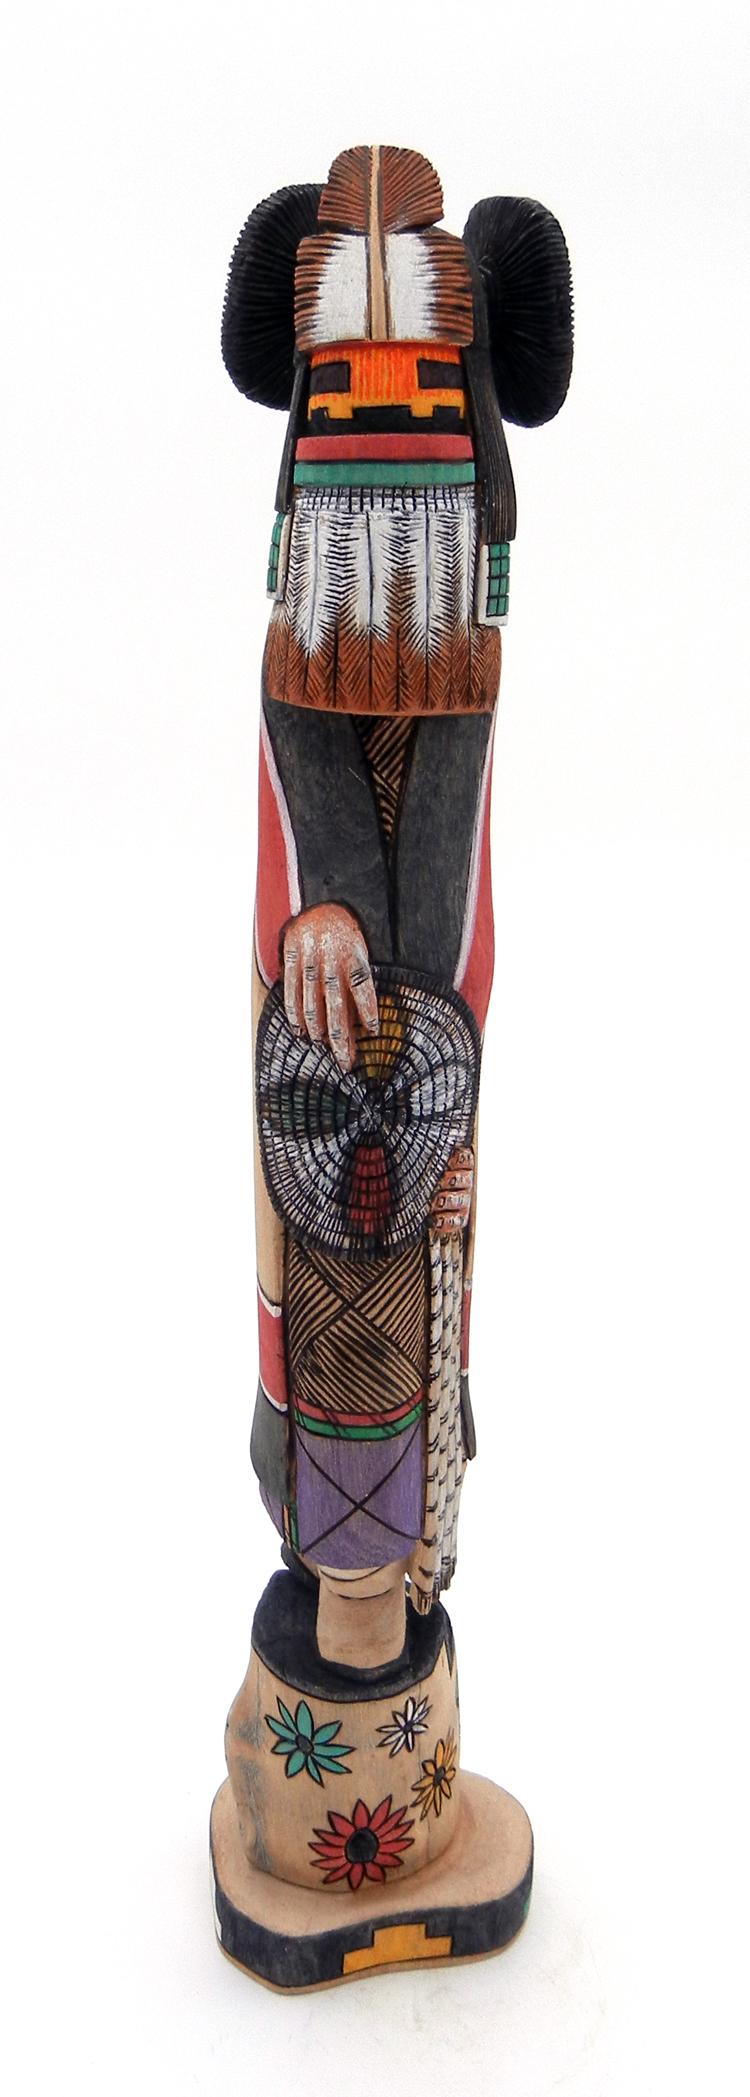 Hopi Kachin Mana (Kachina Maiden/Corn Maiden) Kachina by Jefferson James